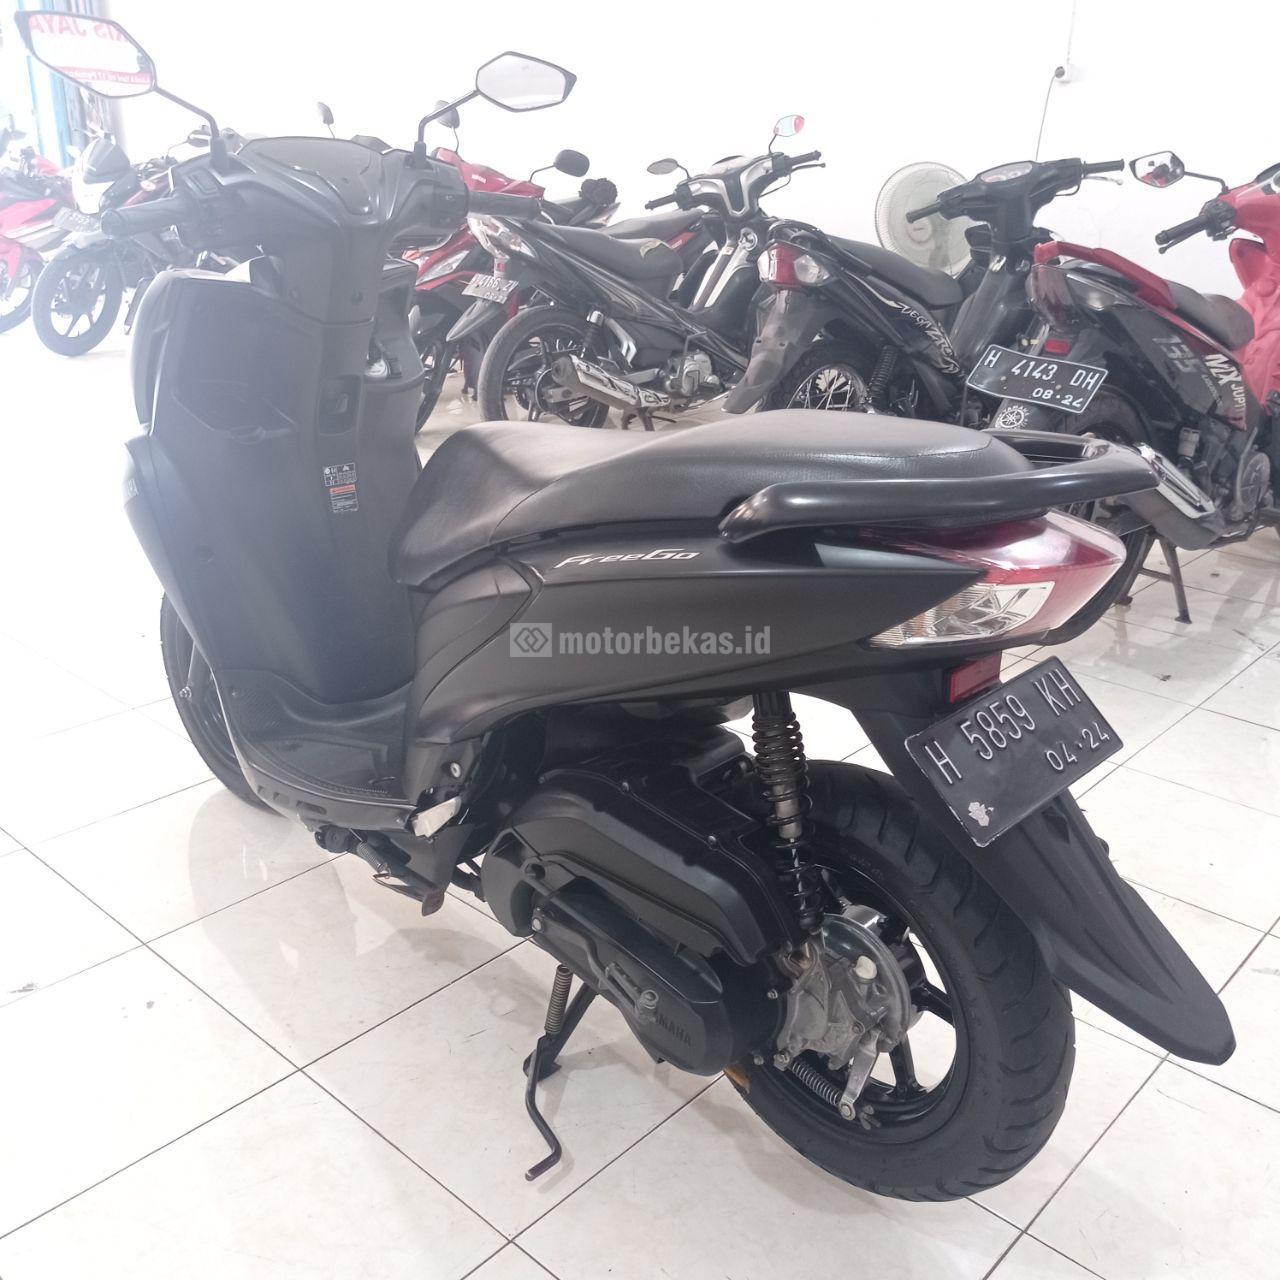 YAMAHA FREE GO  789 motorbekas.id